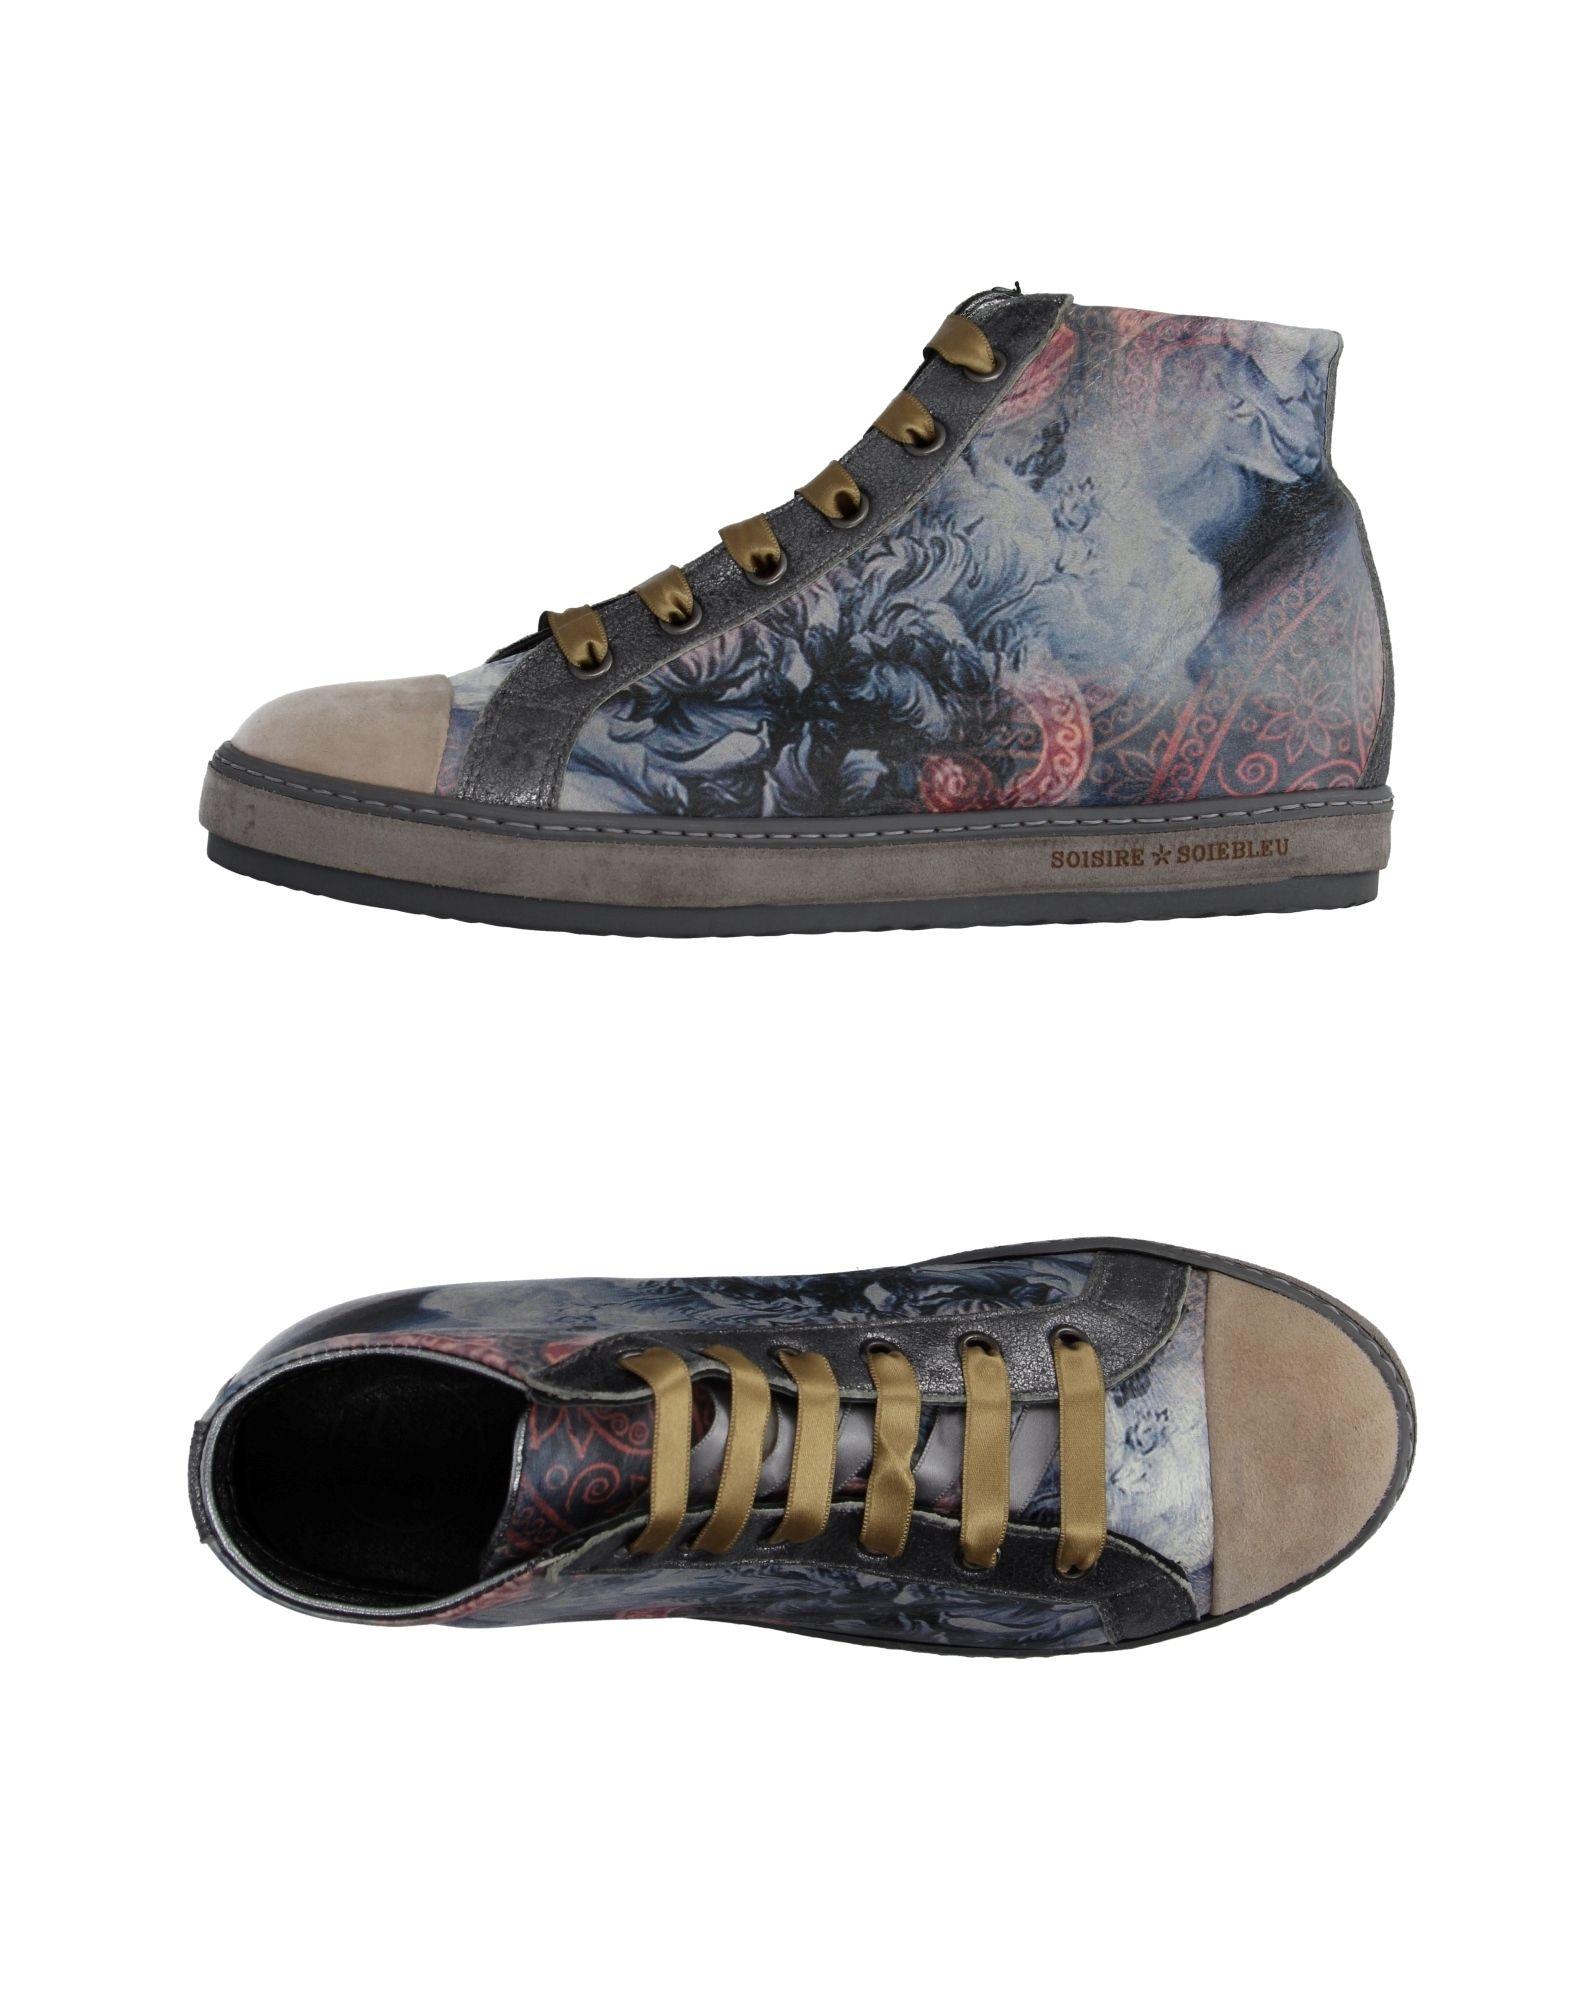 Soisire on Soiebleu Sneakers - Women Soisire Soiebleu Sneakers online on Soisire  Australia - 11063351SI b48b85